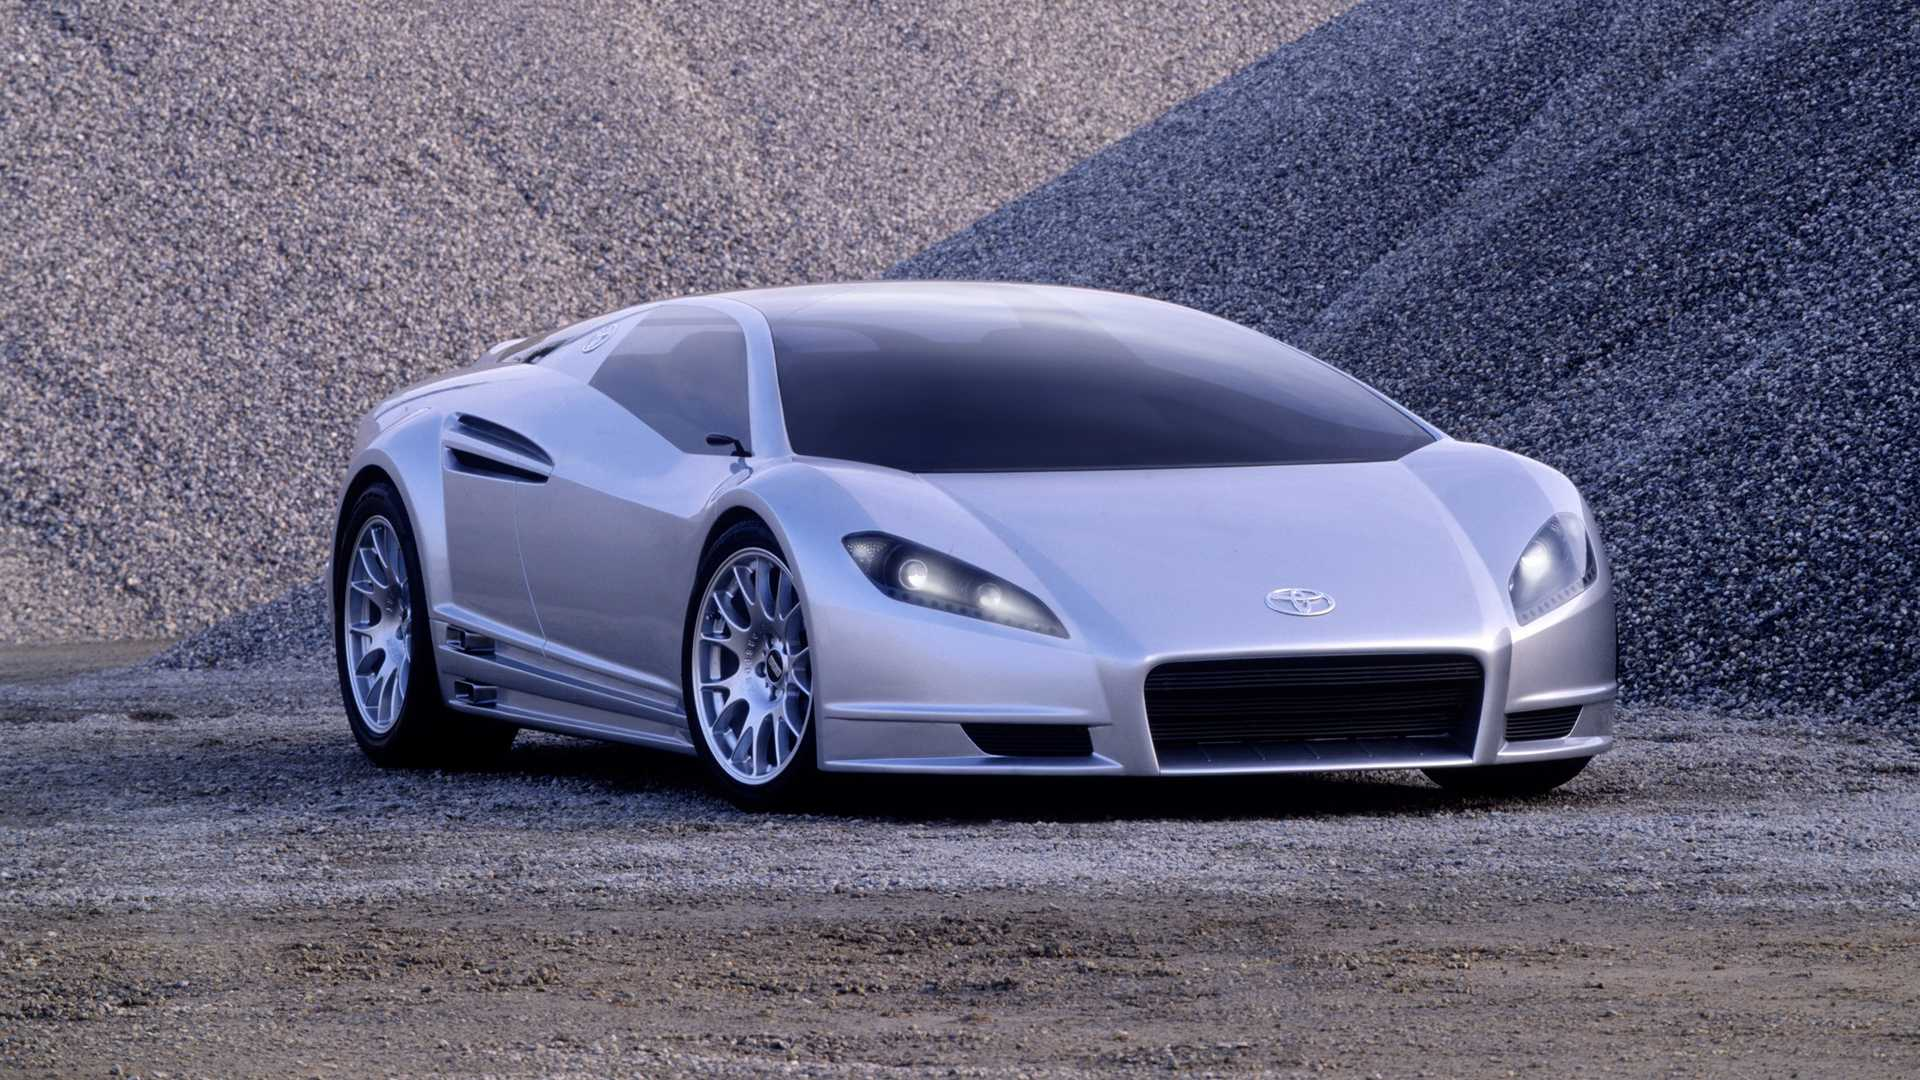 Toyota-Alessandro-Volta-concept-2004-16